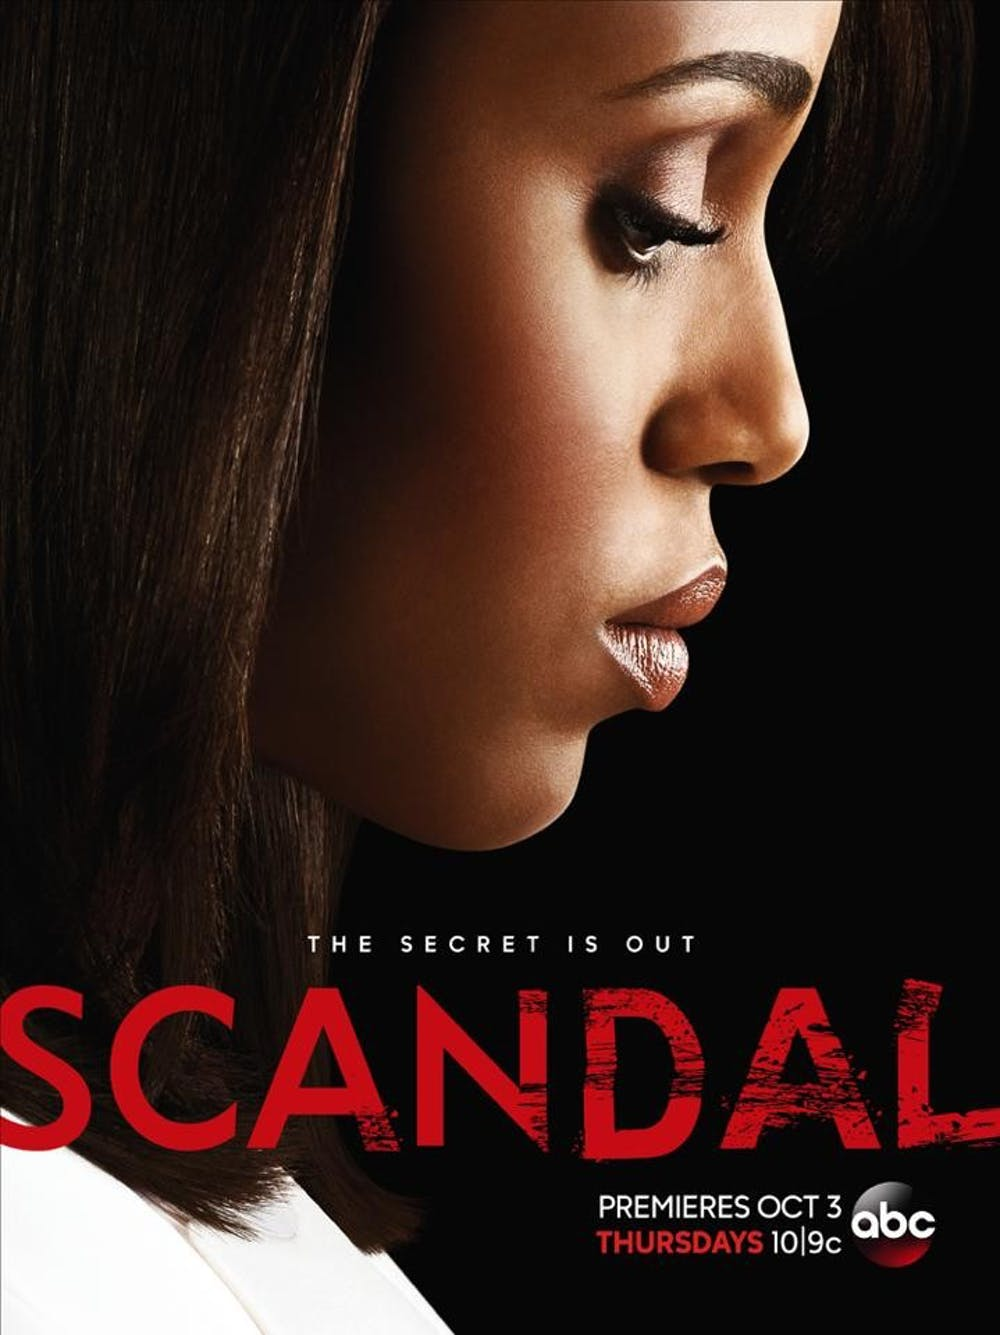 Scandal's third season set to thrill fans